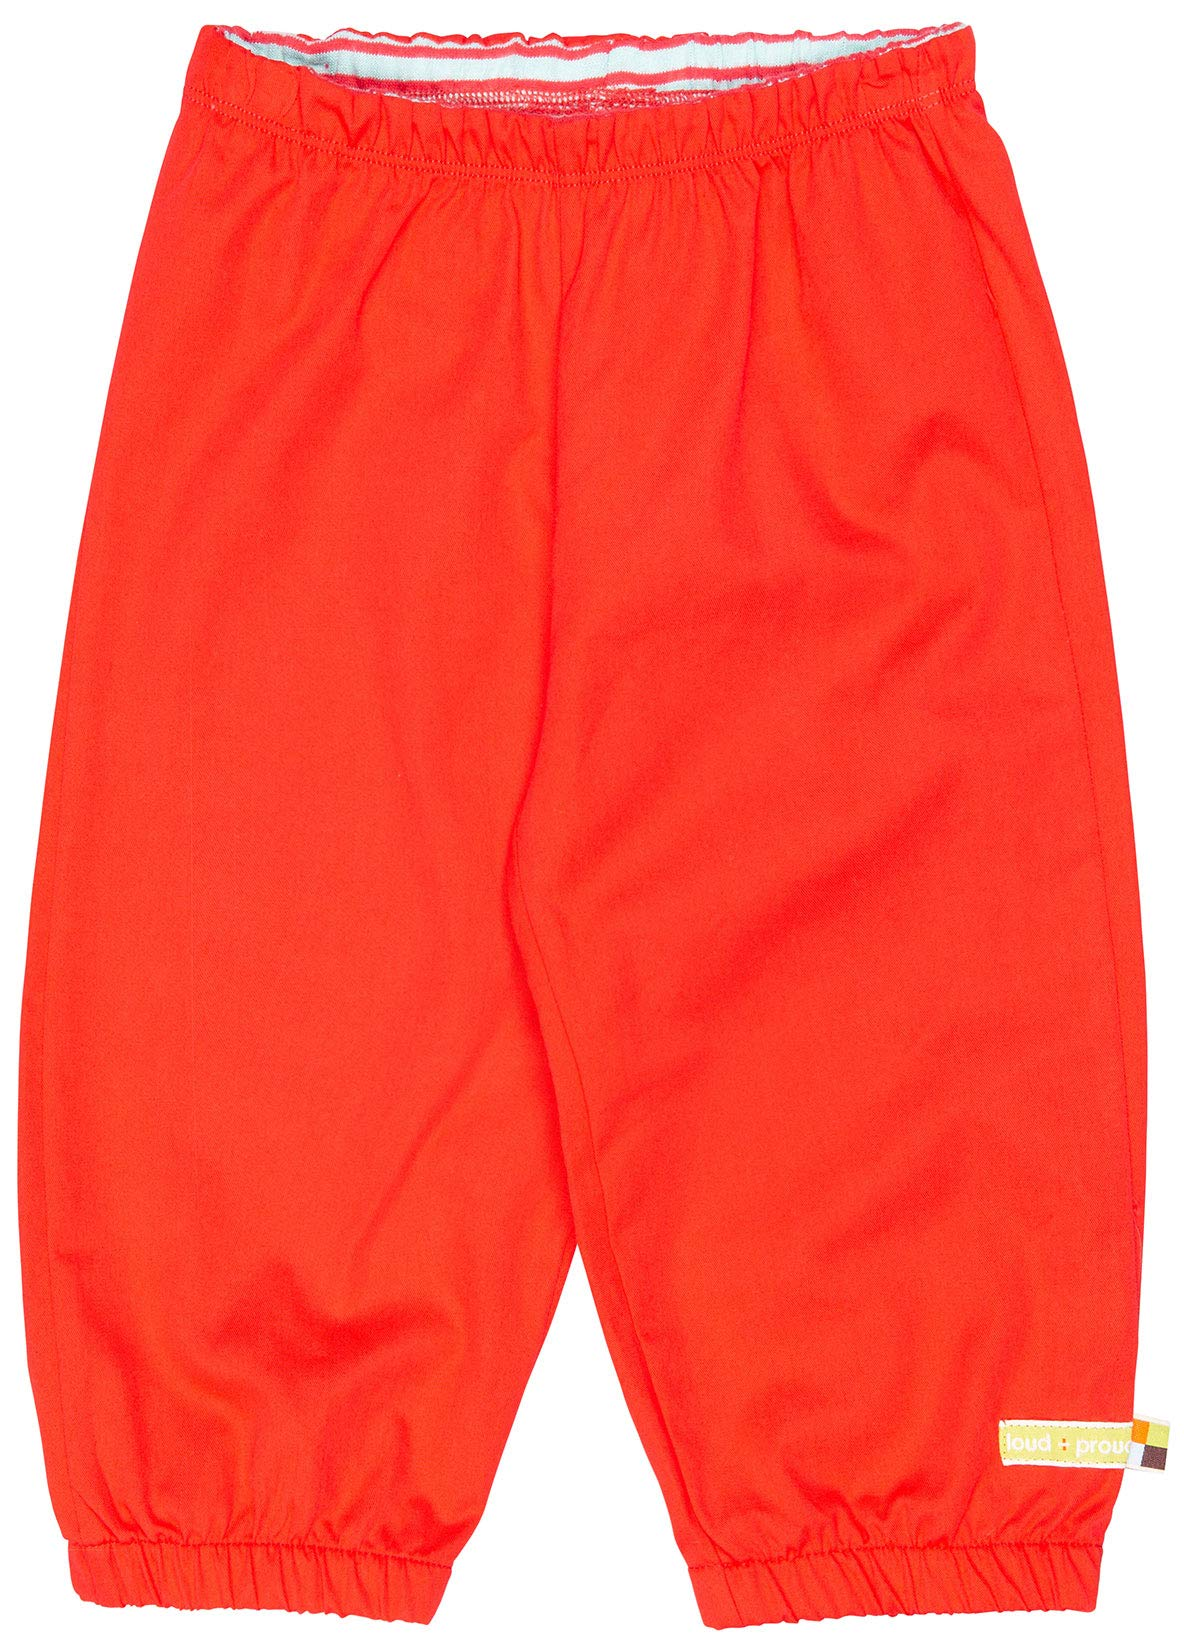 loud + proud Wasserabweisende Outdoorhose, Aus Bio Baumwolle, Gots Zertiziziert Pantalones para Bebés 1